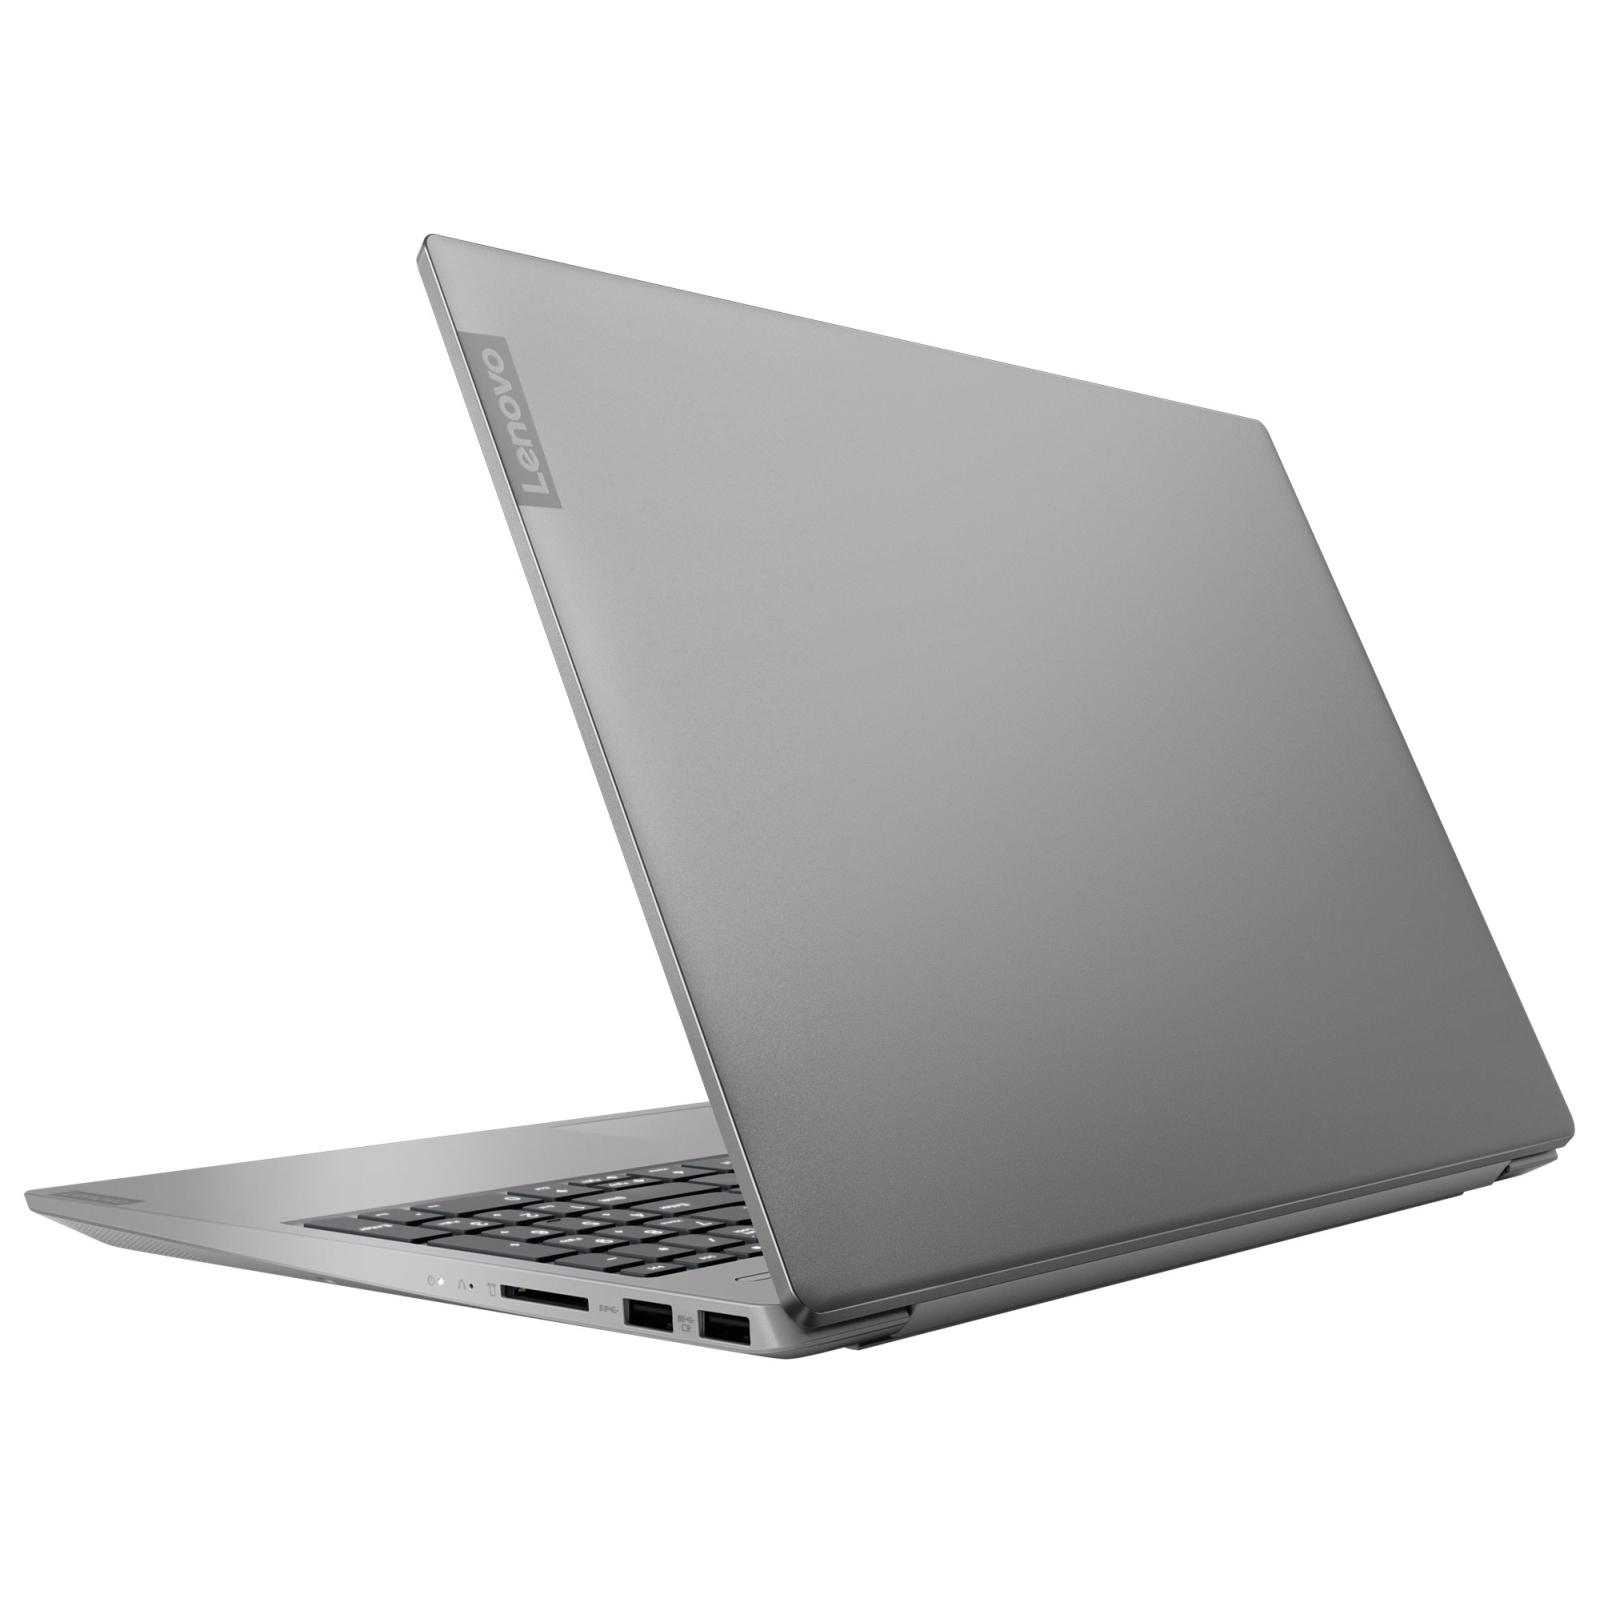 Ноутбук Lenovo IdeaPad S340-15 (81N800Y5RA) изображение 7